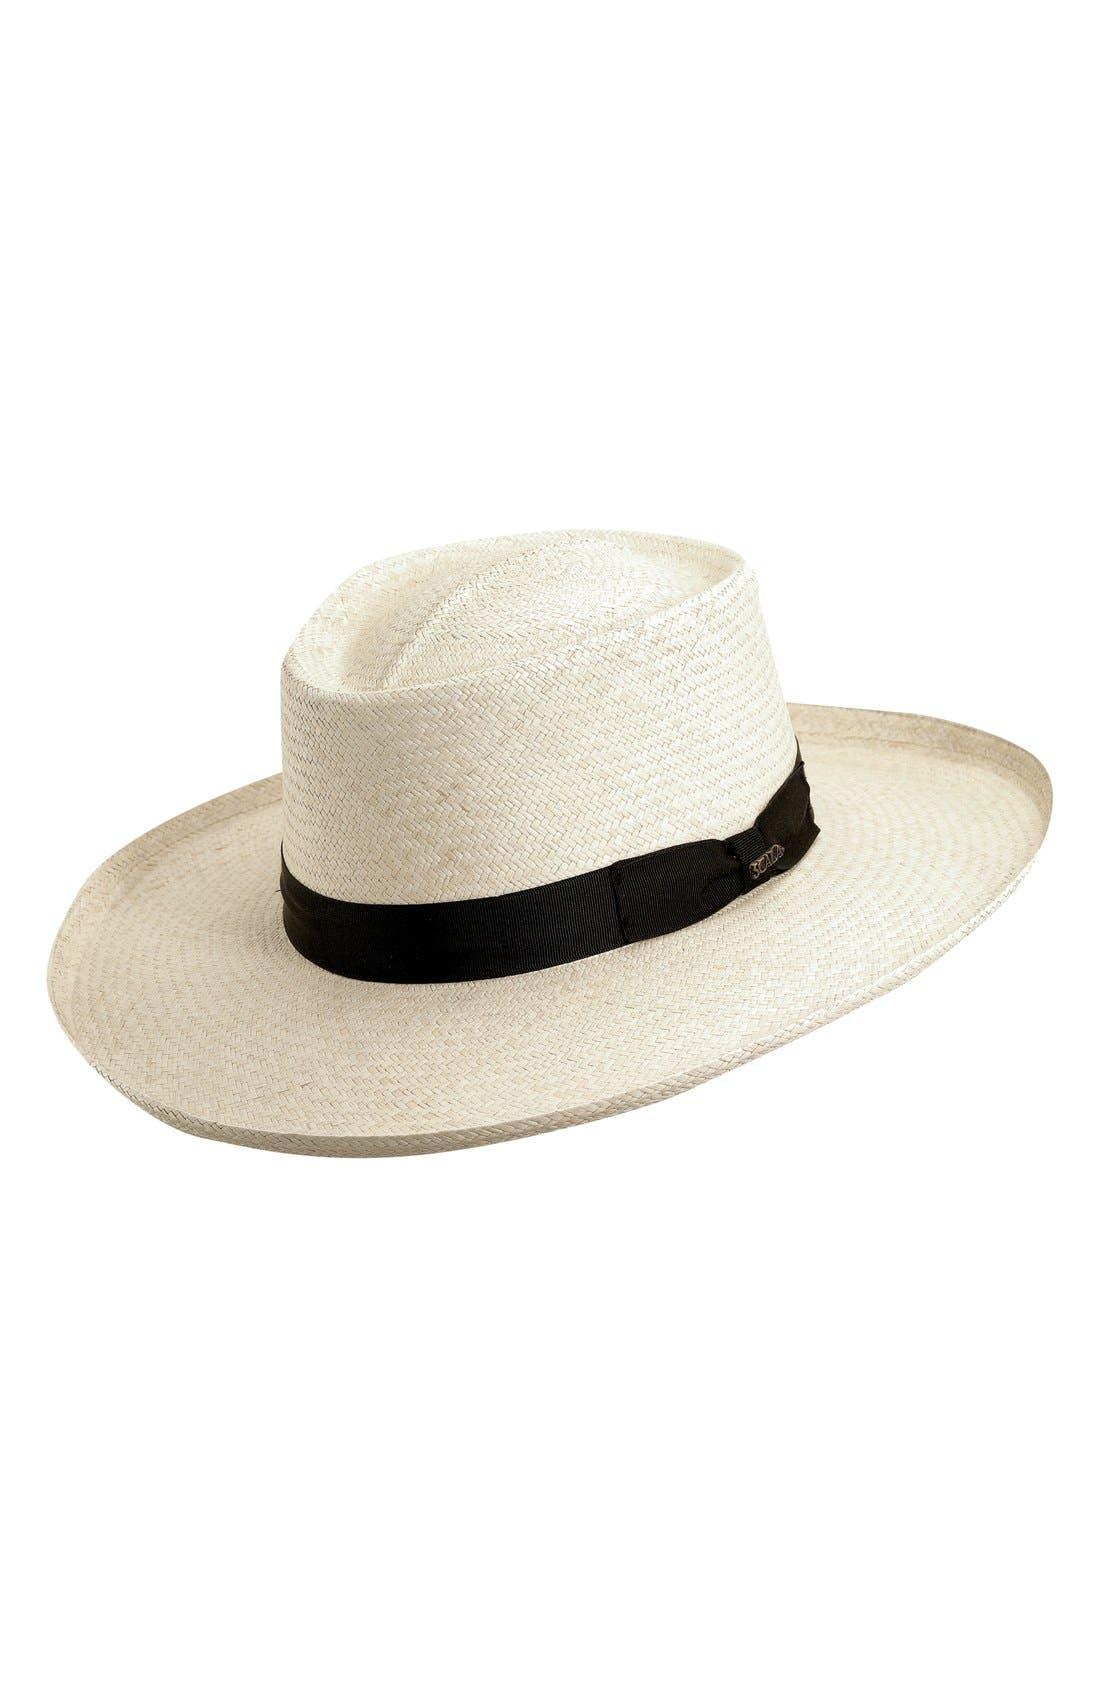 Straw Gambler Hat,                         Main,                         color, NATURAL